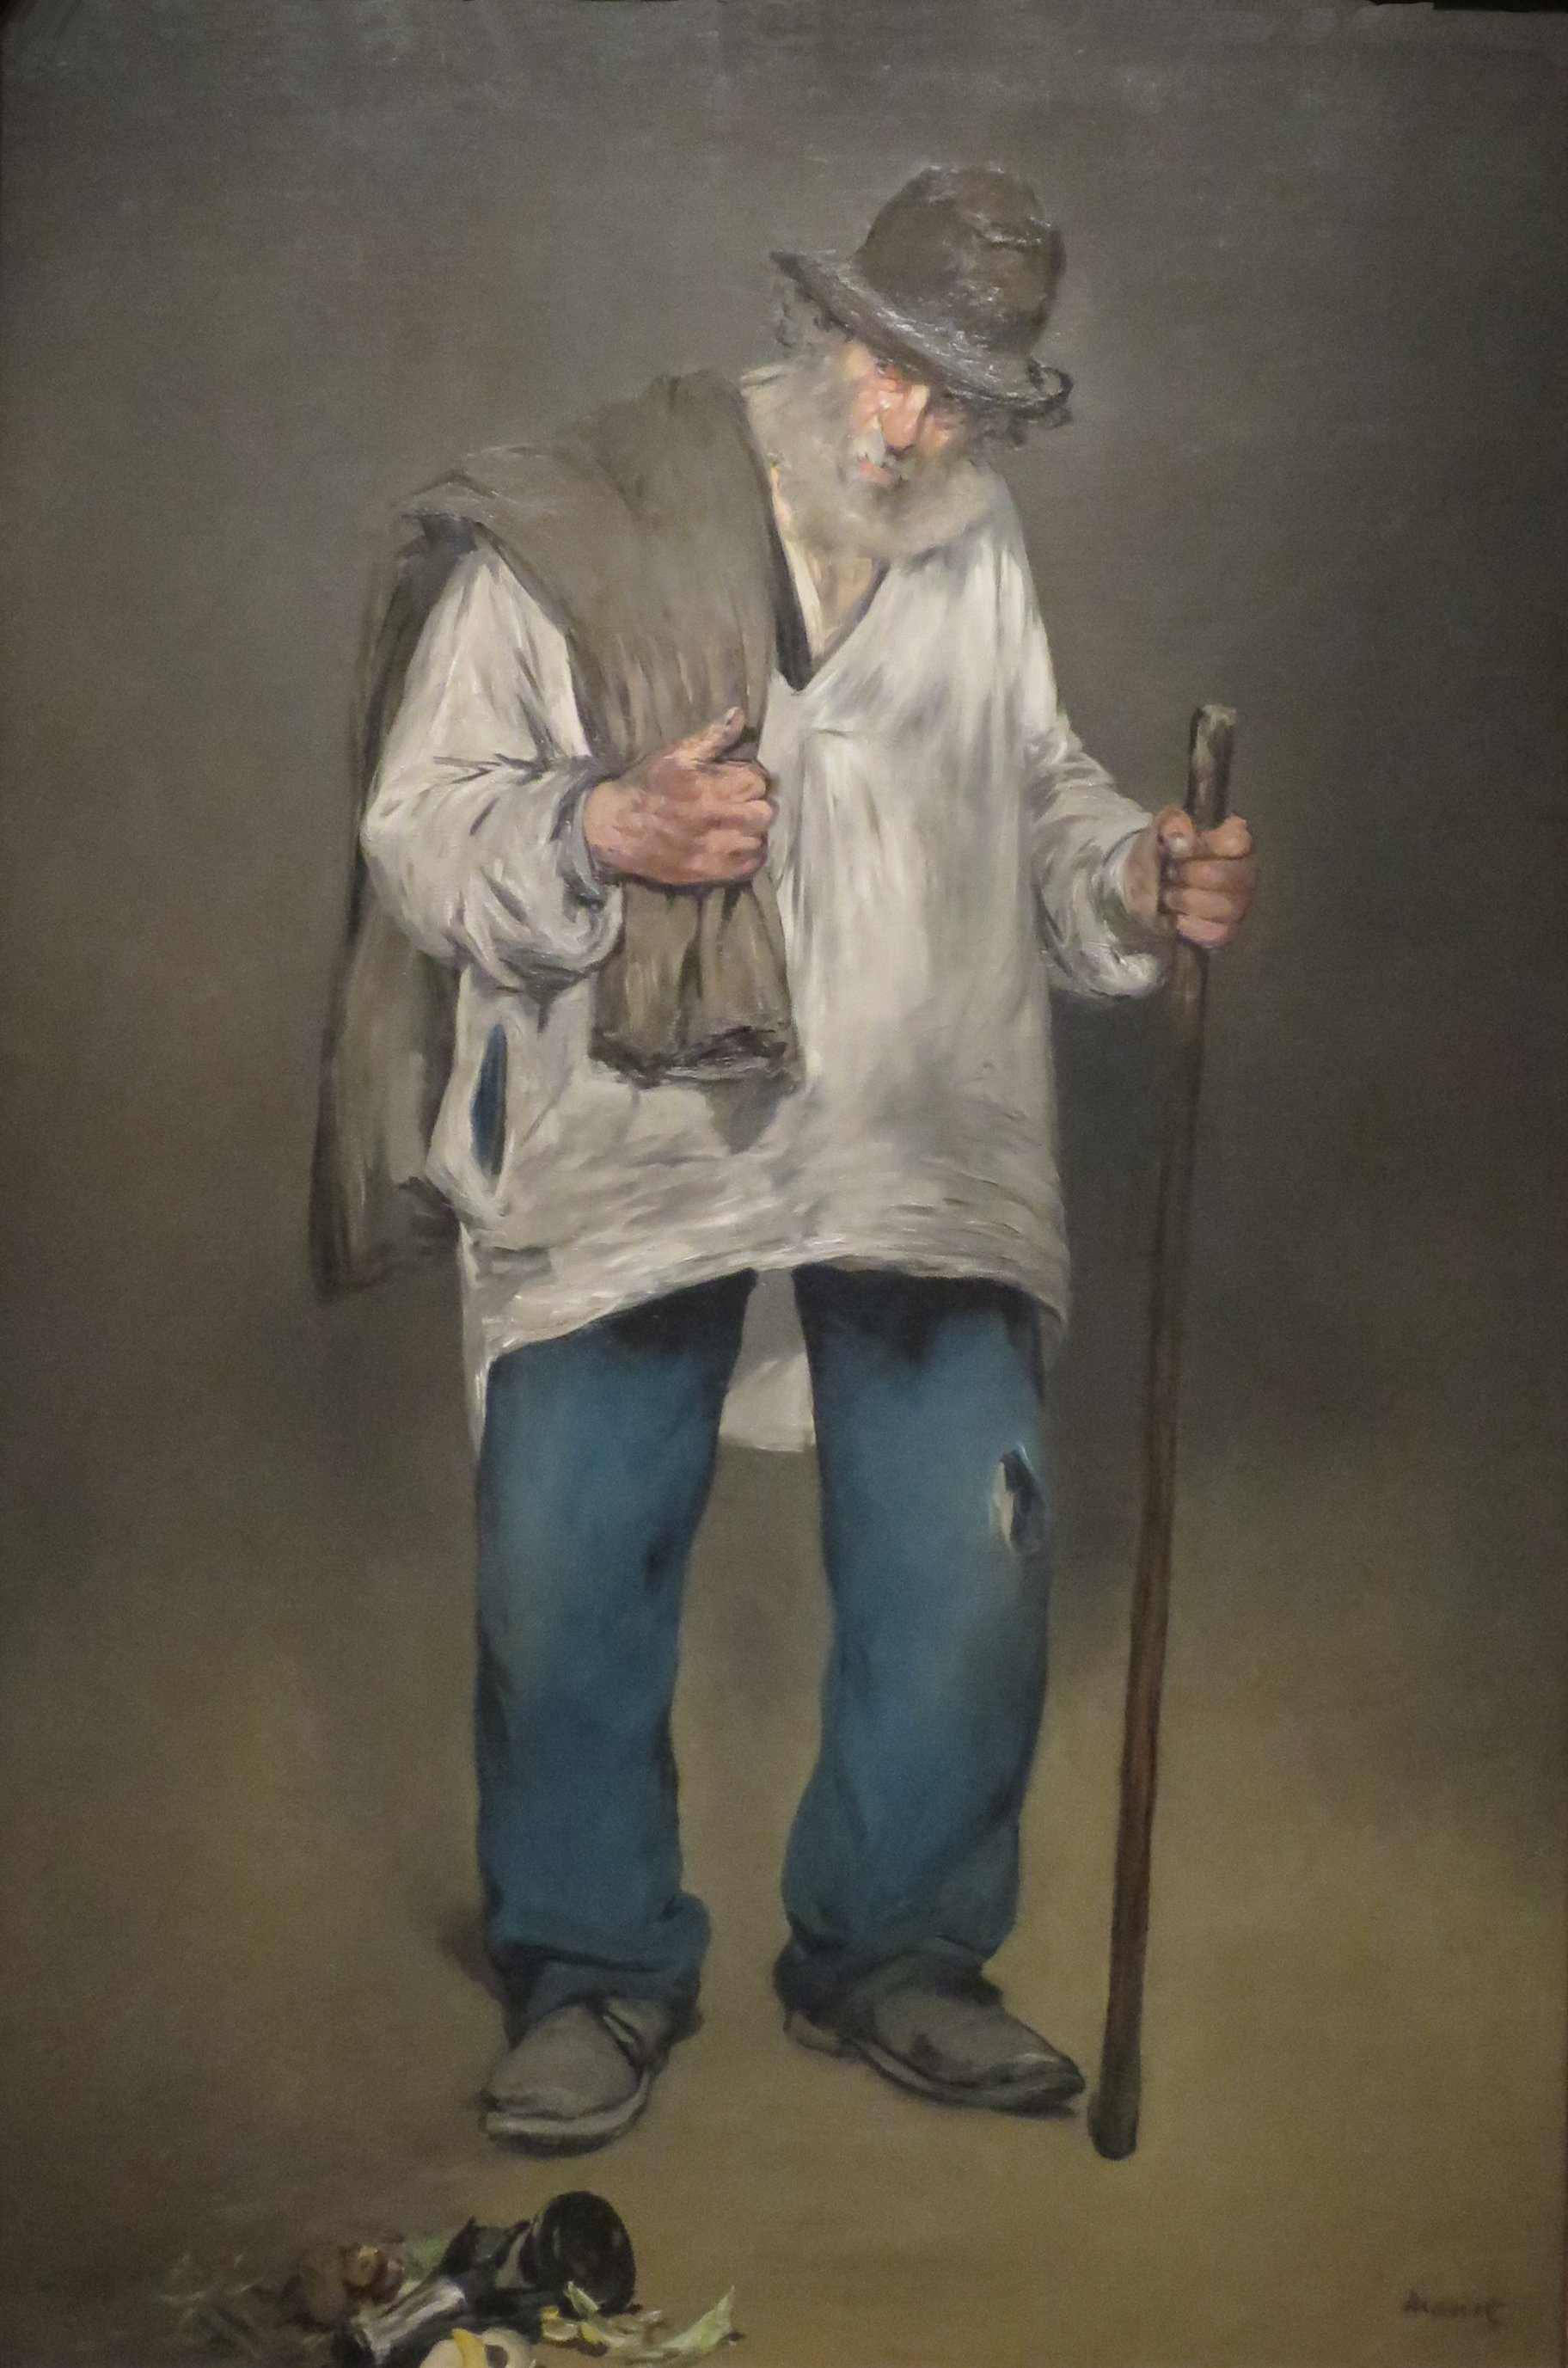 Der Lumpensammler, Gemälde von Édouard Manet (1832-1883), public domain